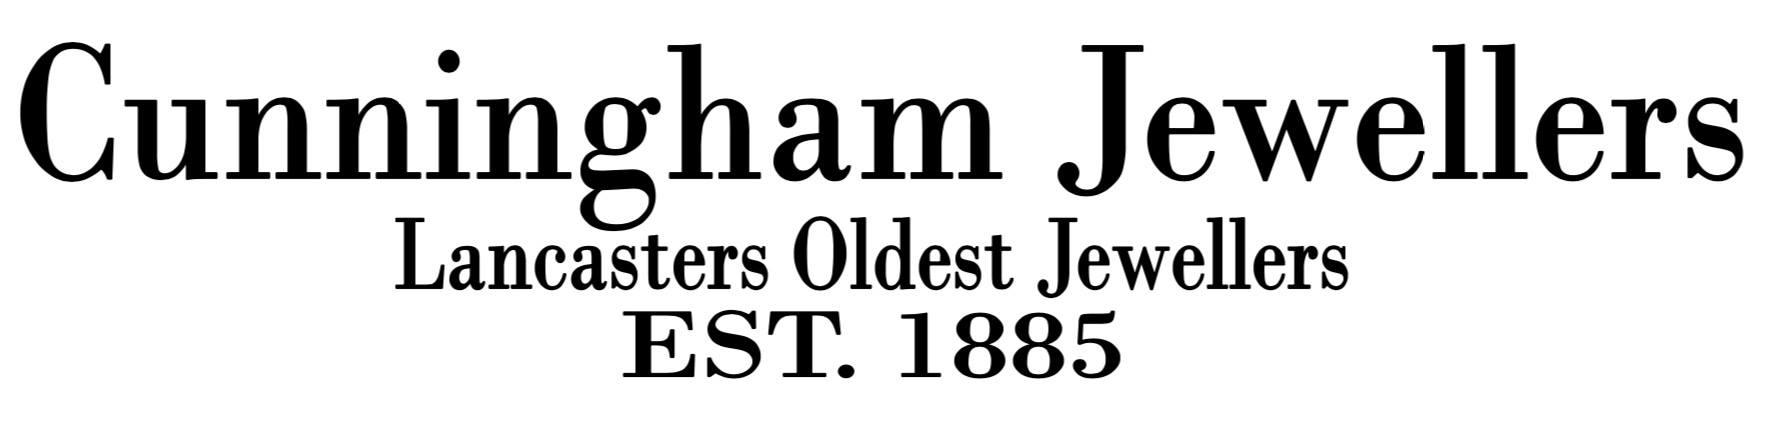 Cunningham Jewellers